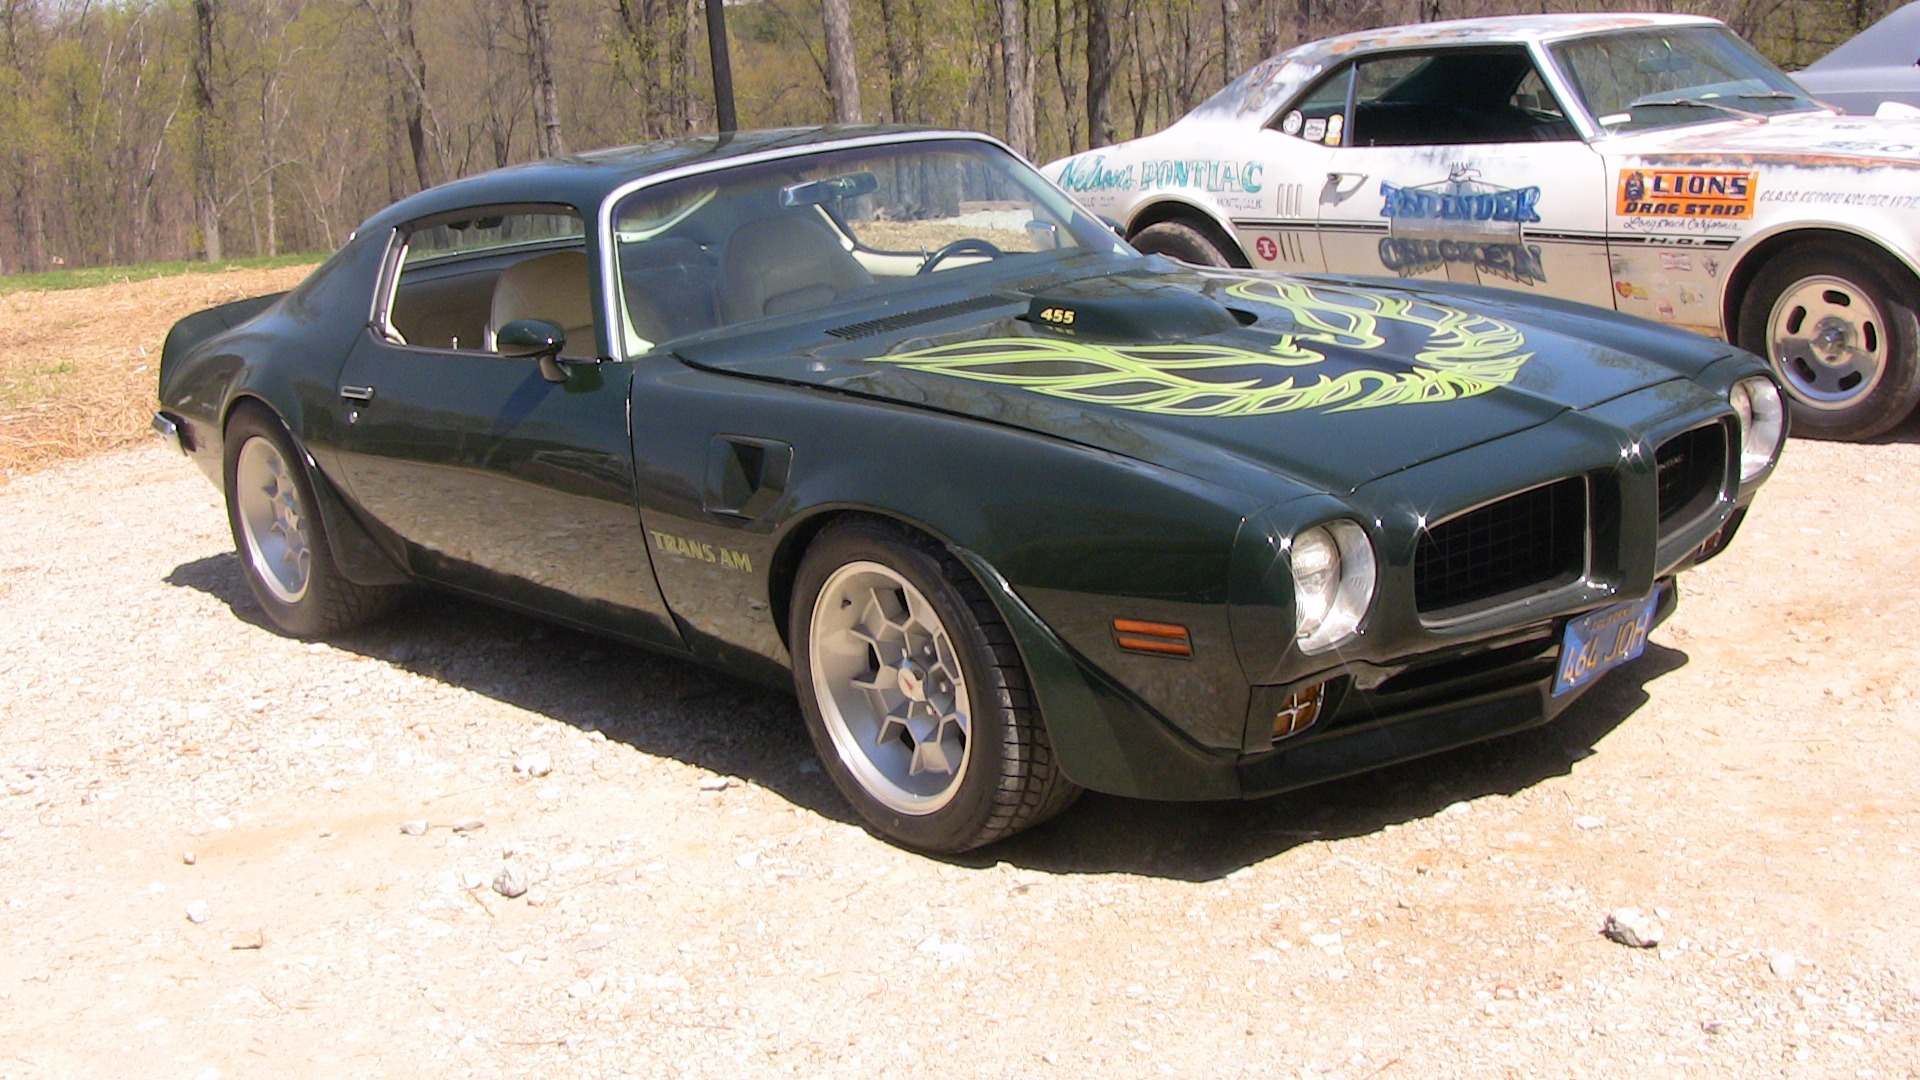 1973 Pontiac Firebird Trans Am For Sale: 1973 Pontiac Trans Am Stock # A140 For Sale Near Cornelius